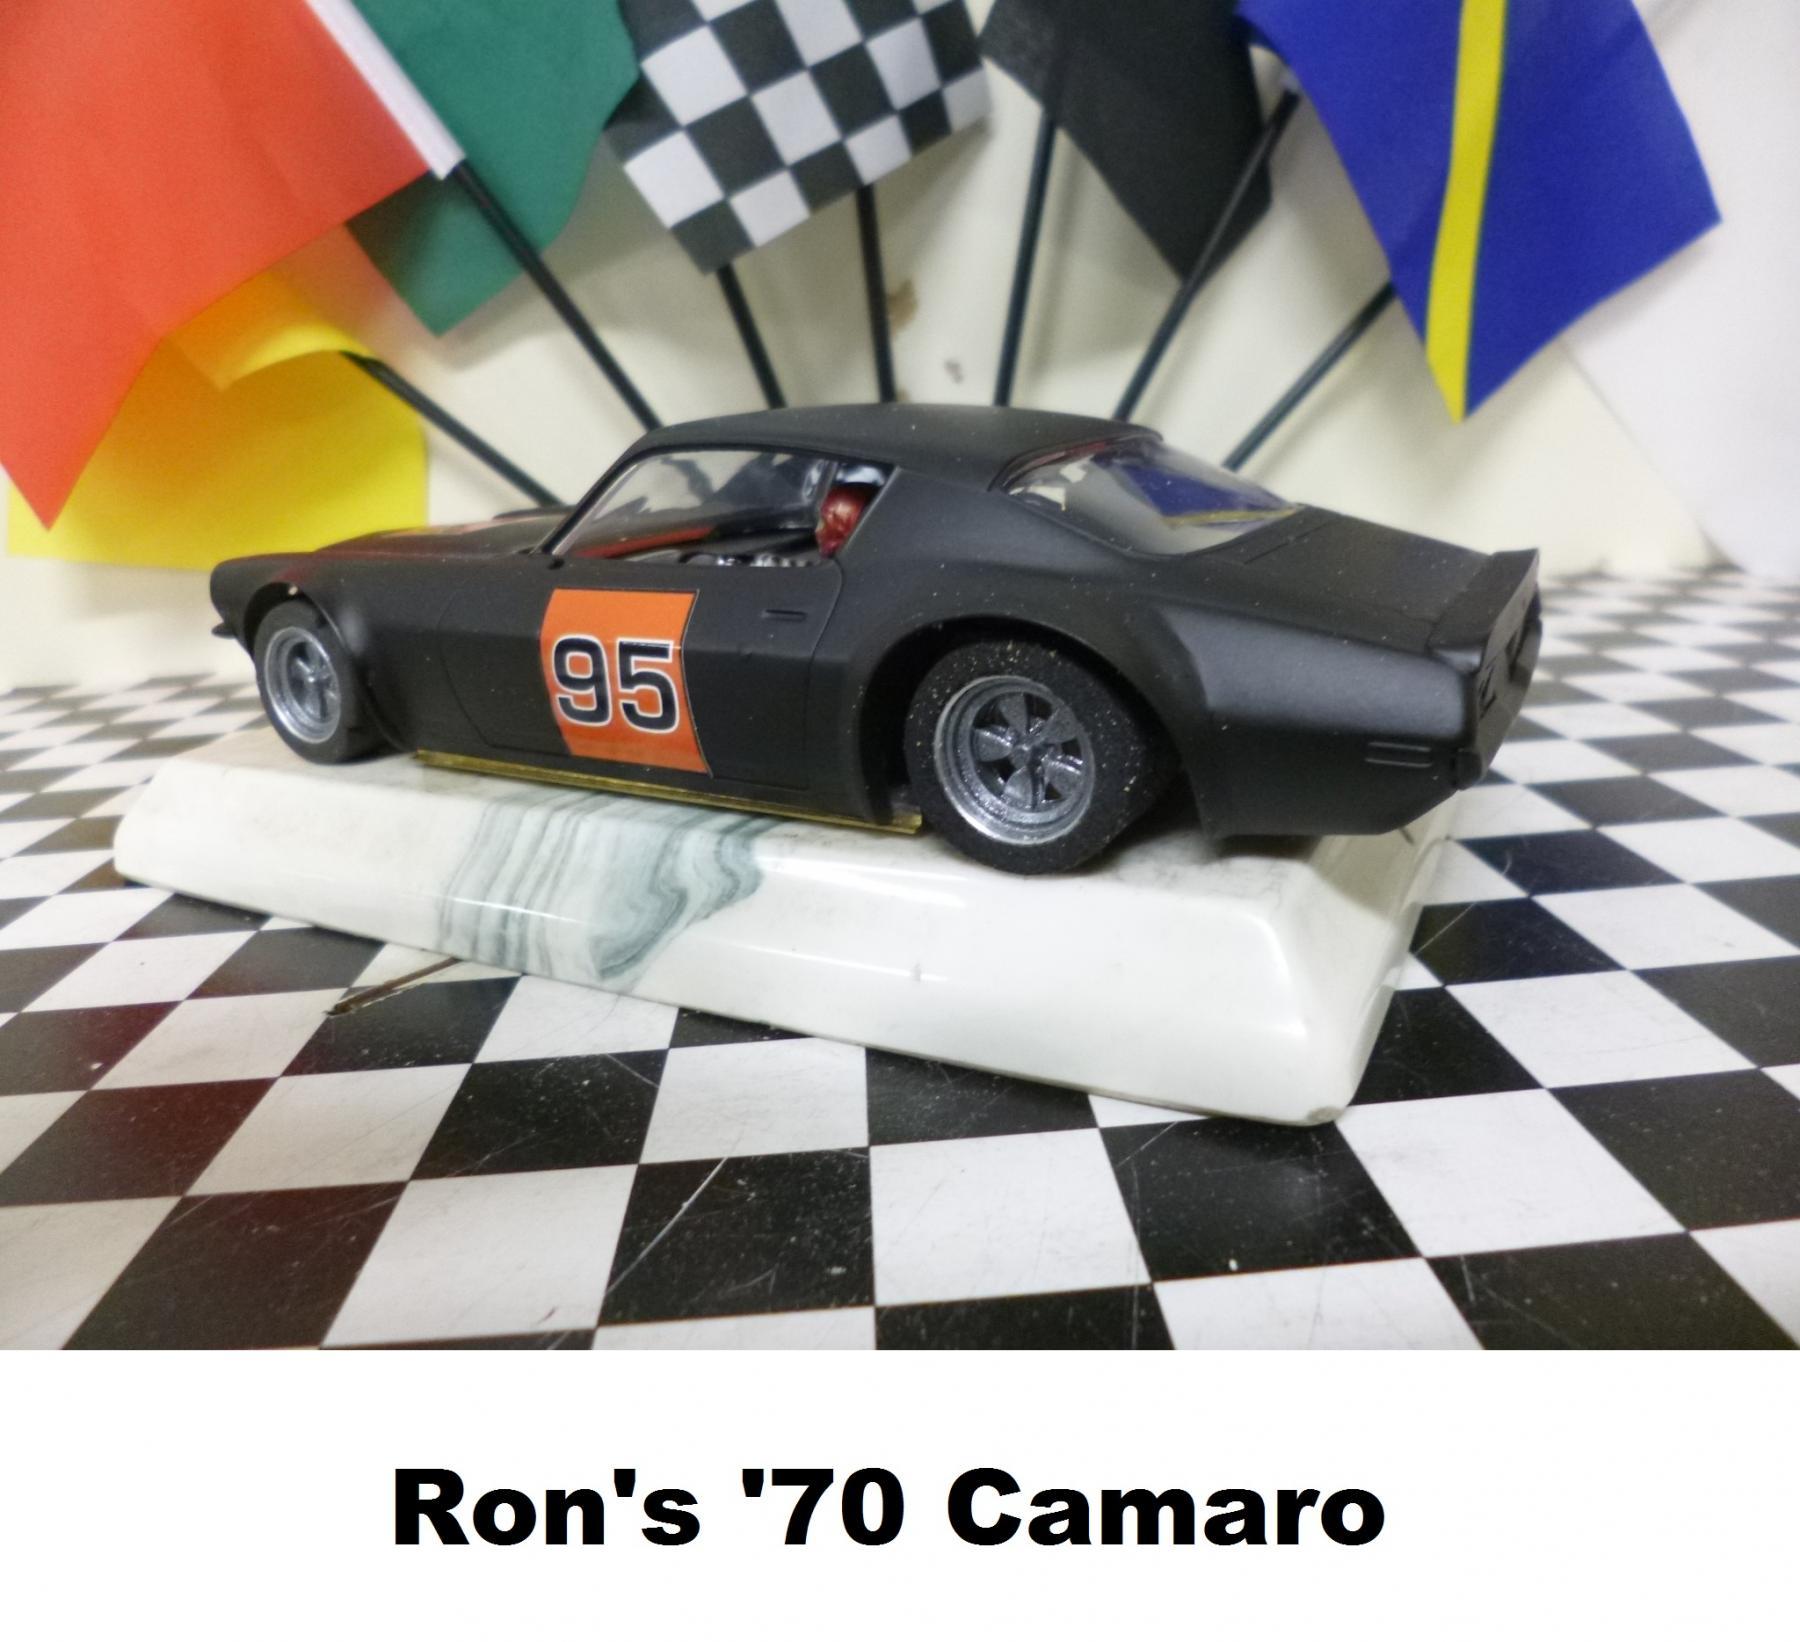 CamaroRon.jpg